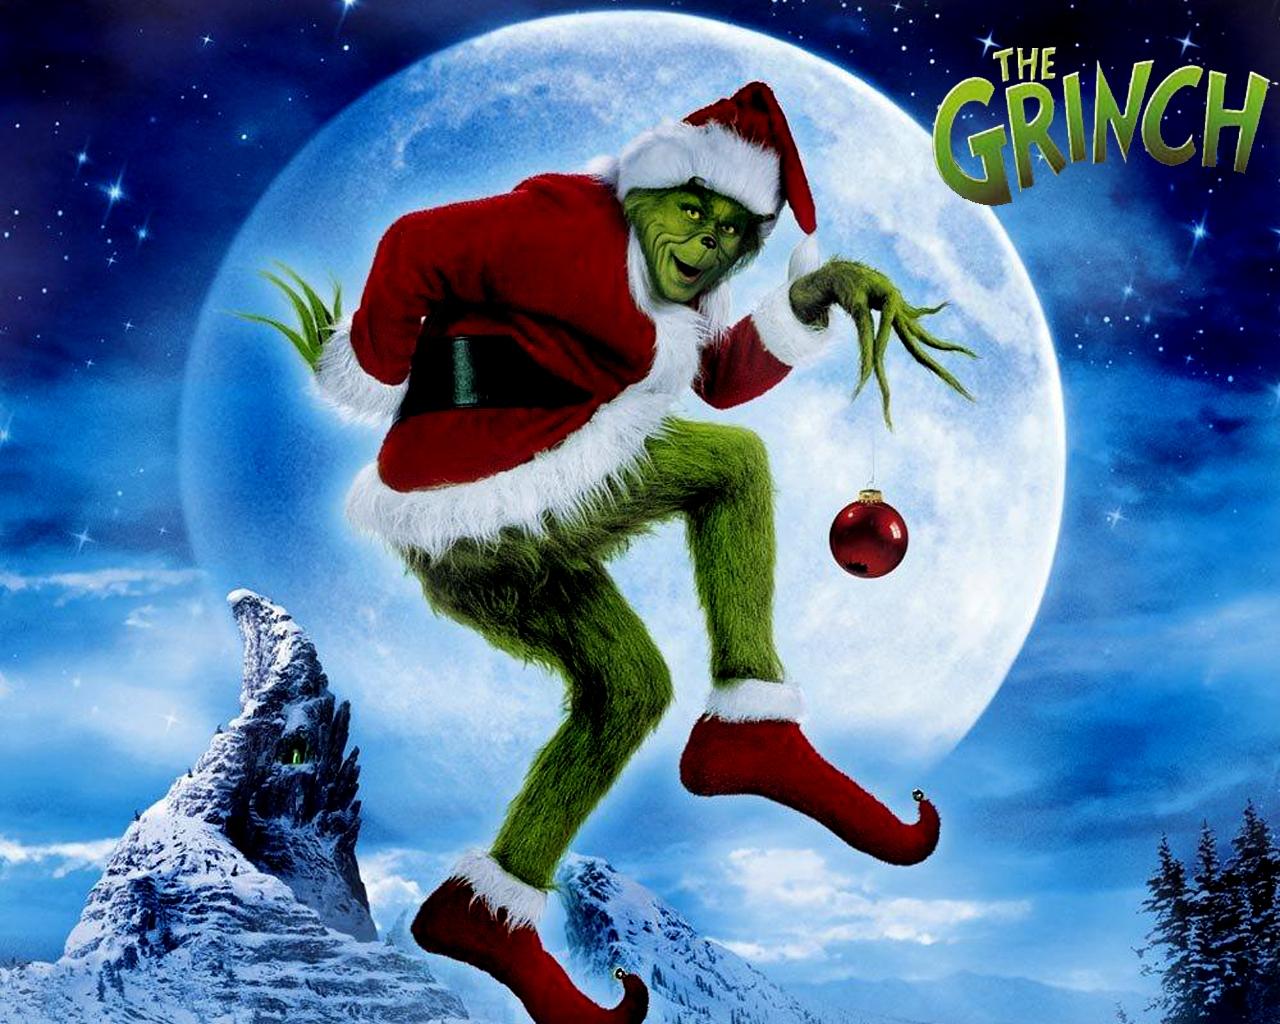 Best 49 The Grinch Christmas Wallpaper on HipWallpaper 1280x1024